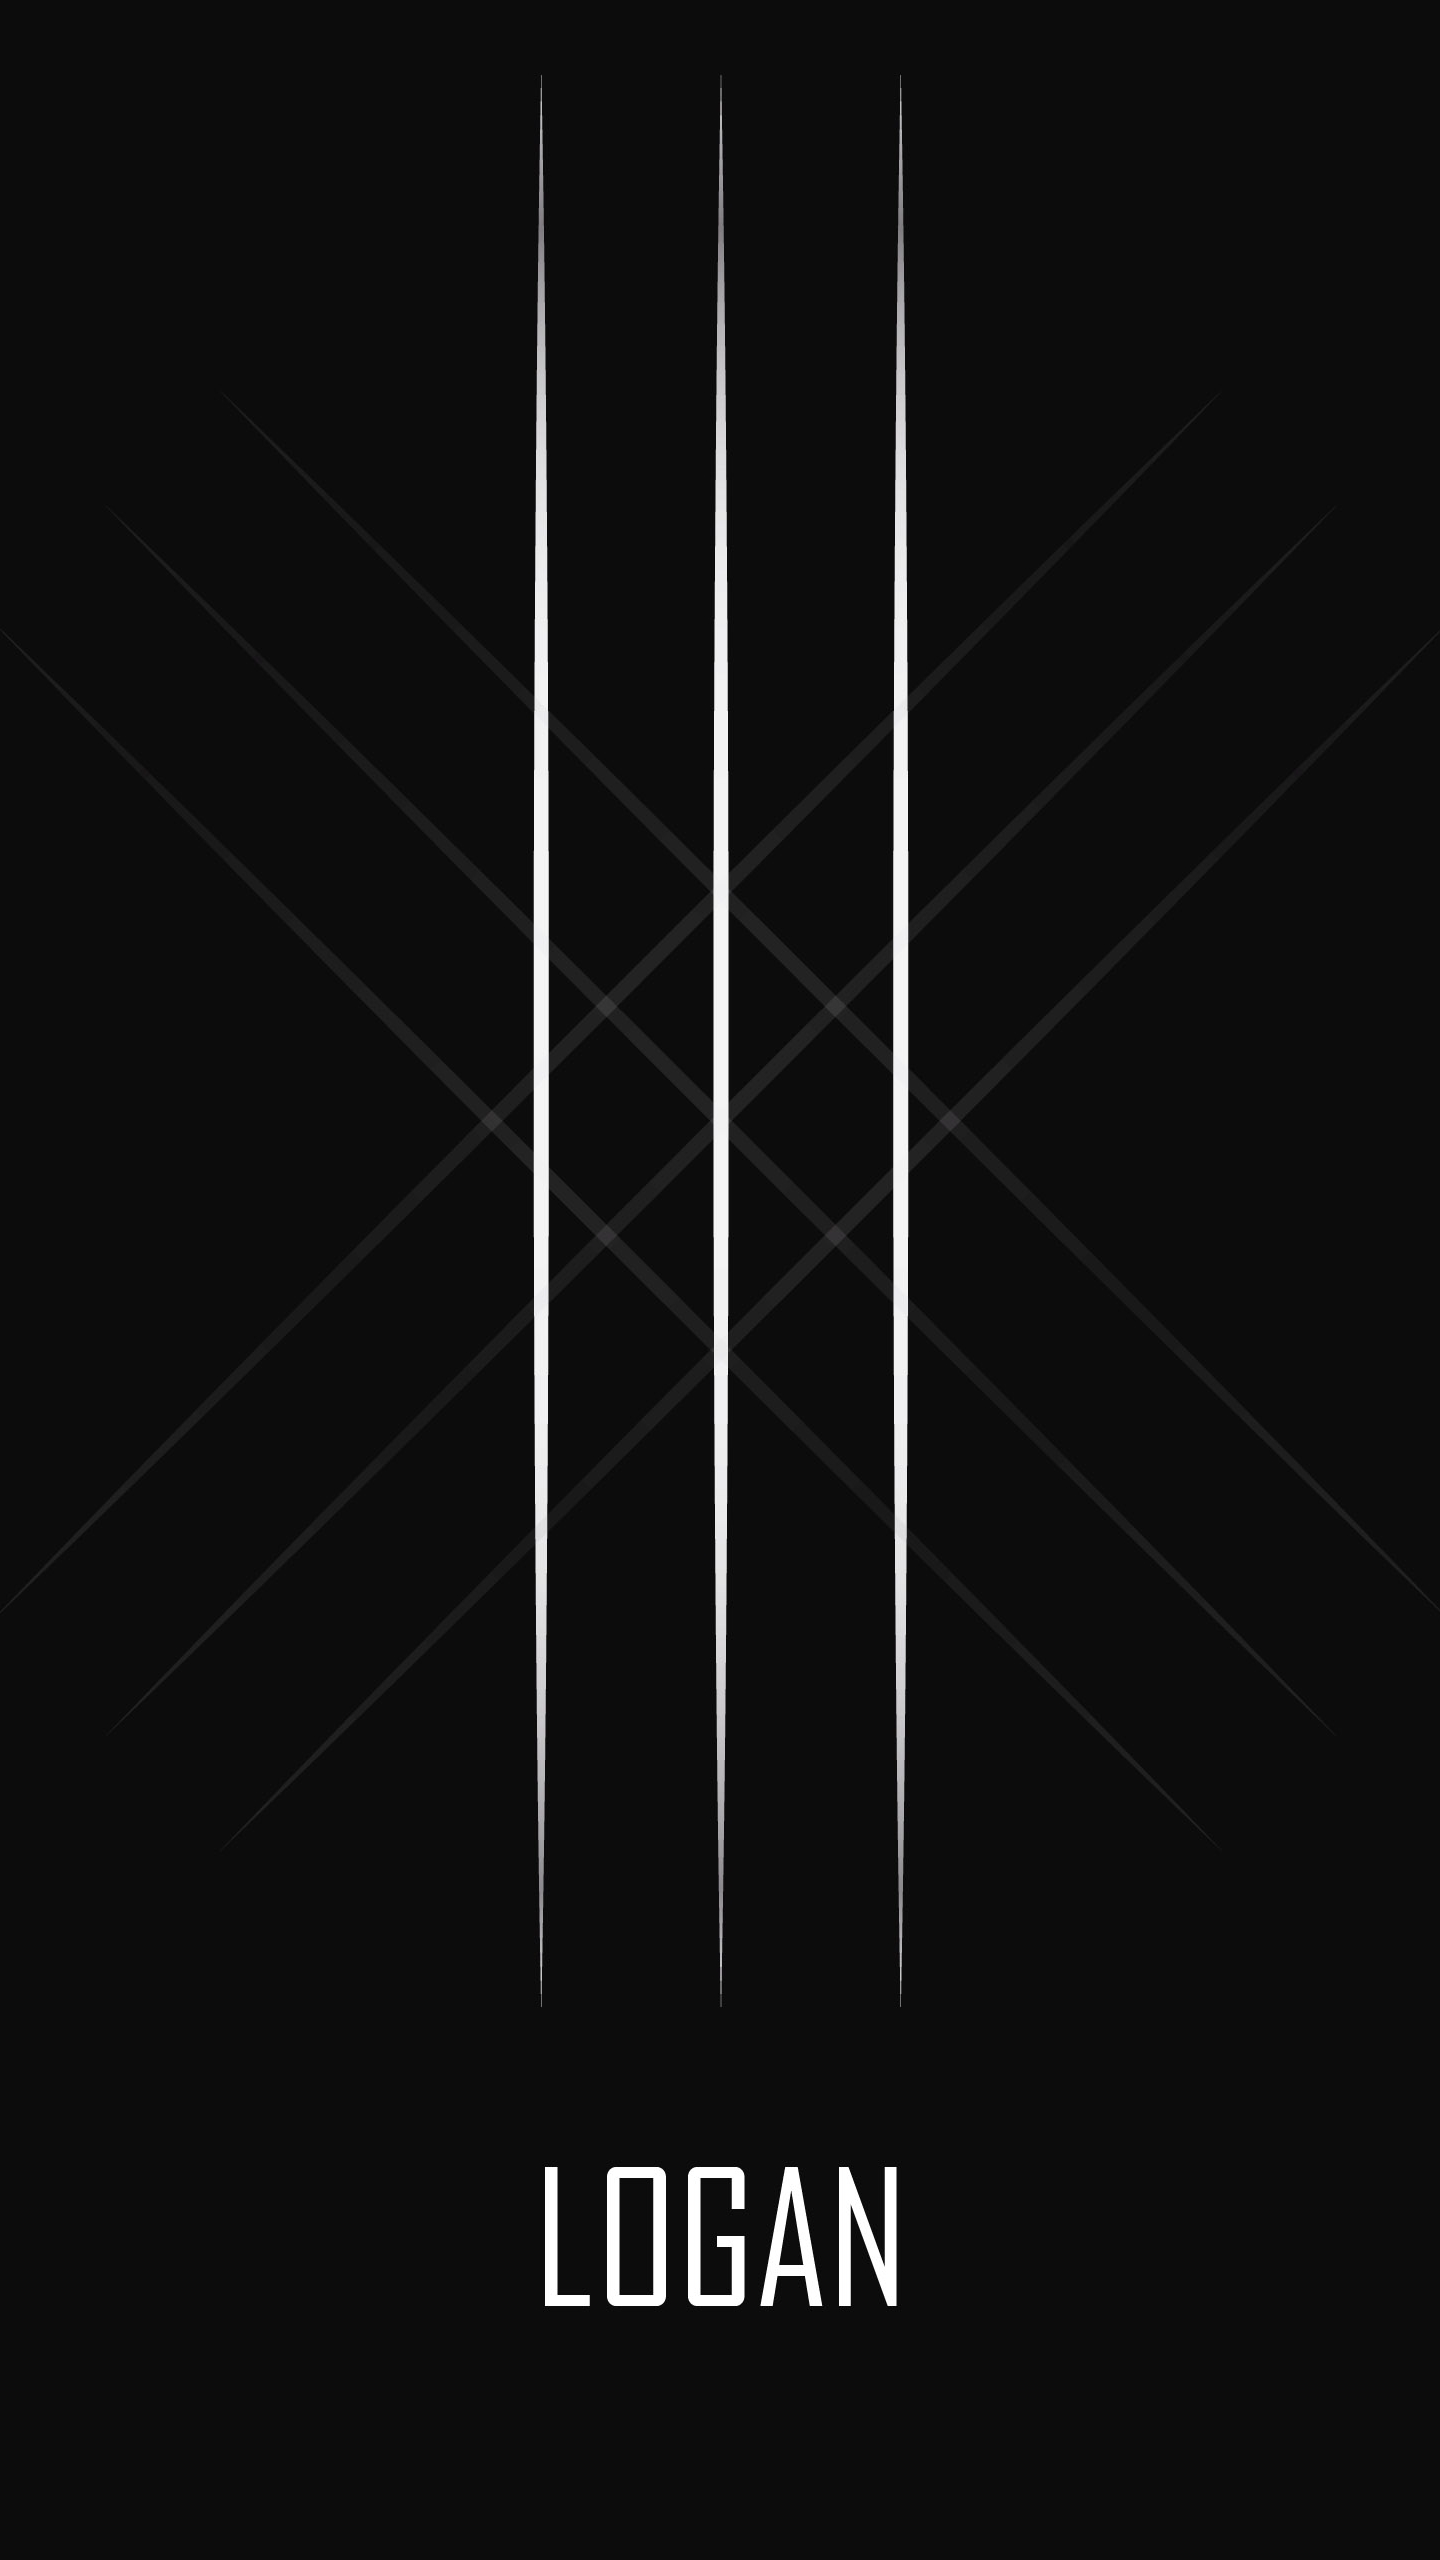 Logan HD iPhone Wallpaper